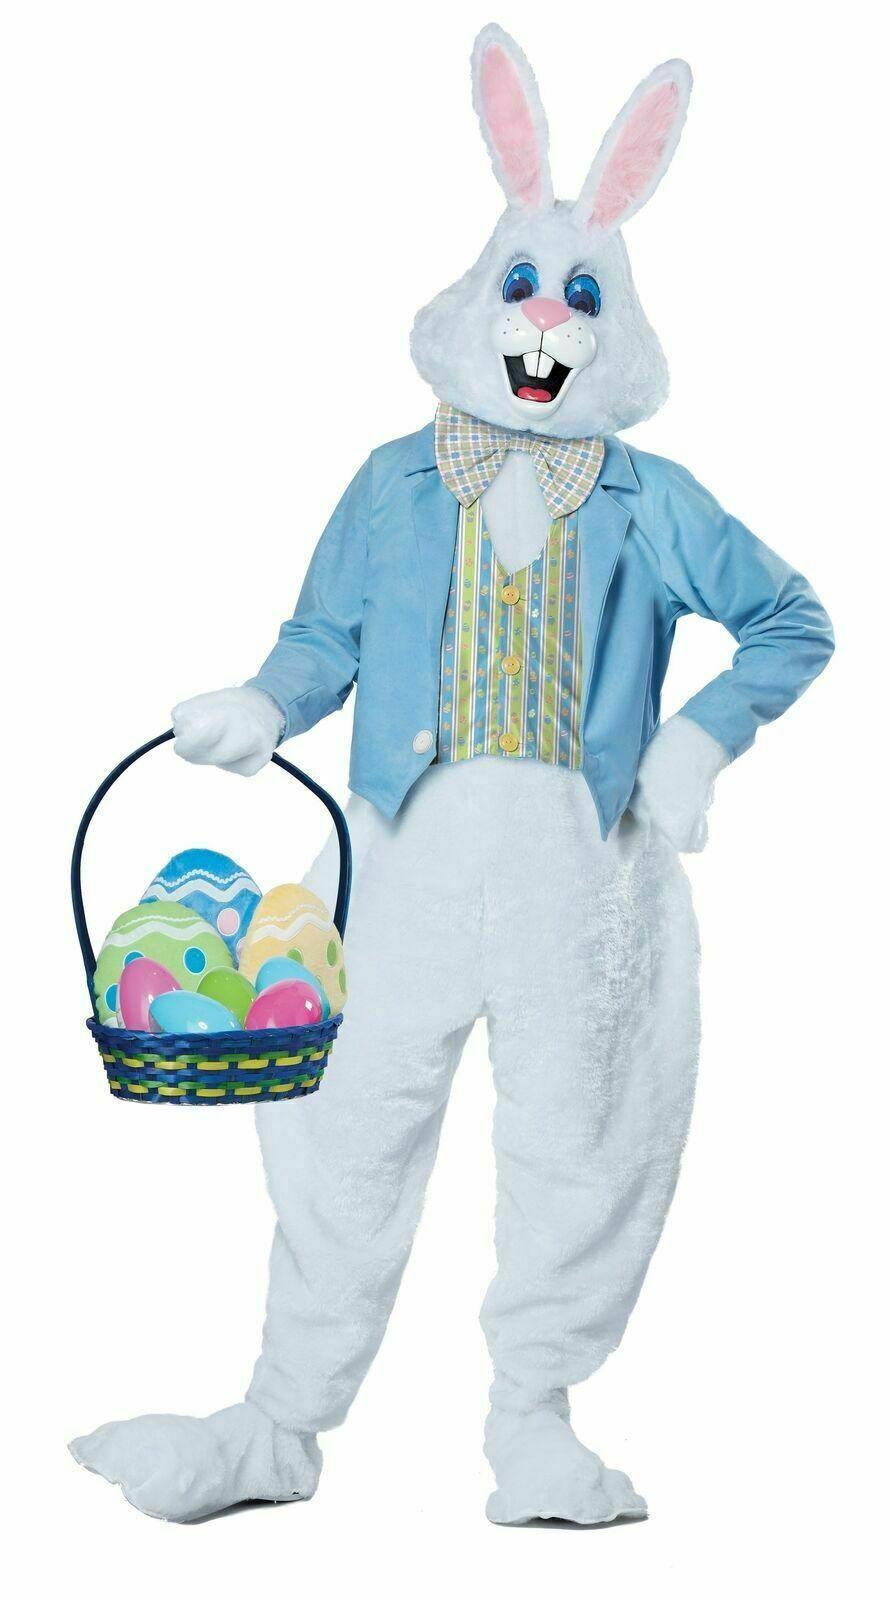 California Costumes Deluxe Easter Bunny Rabbit Adult Hallowe